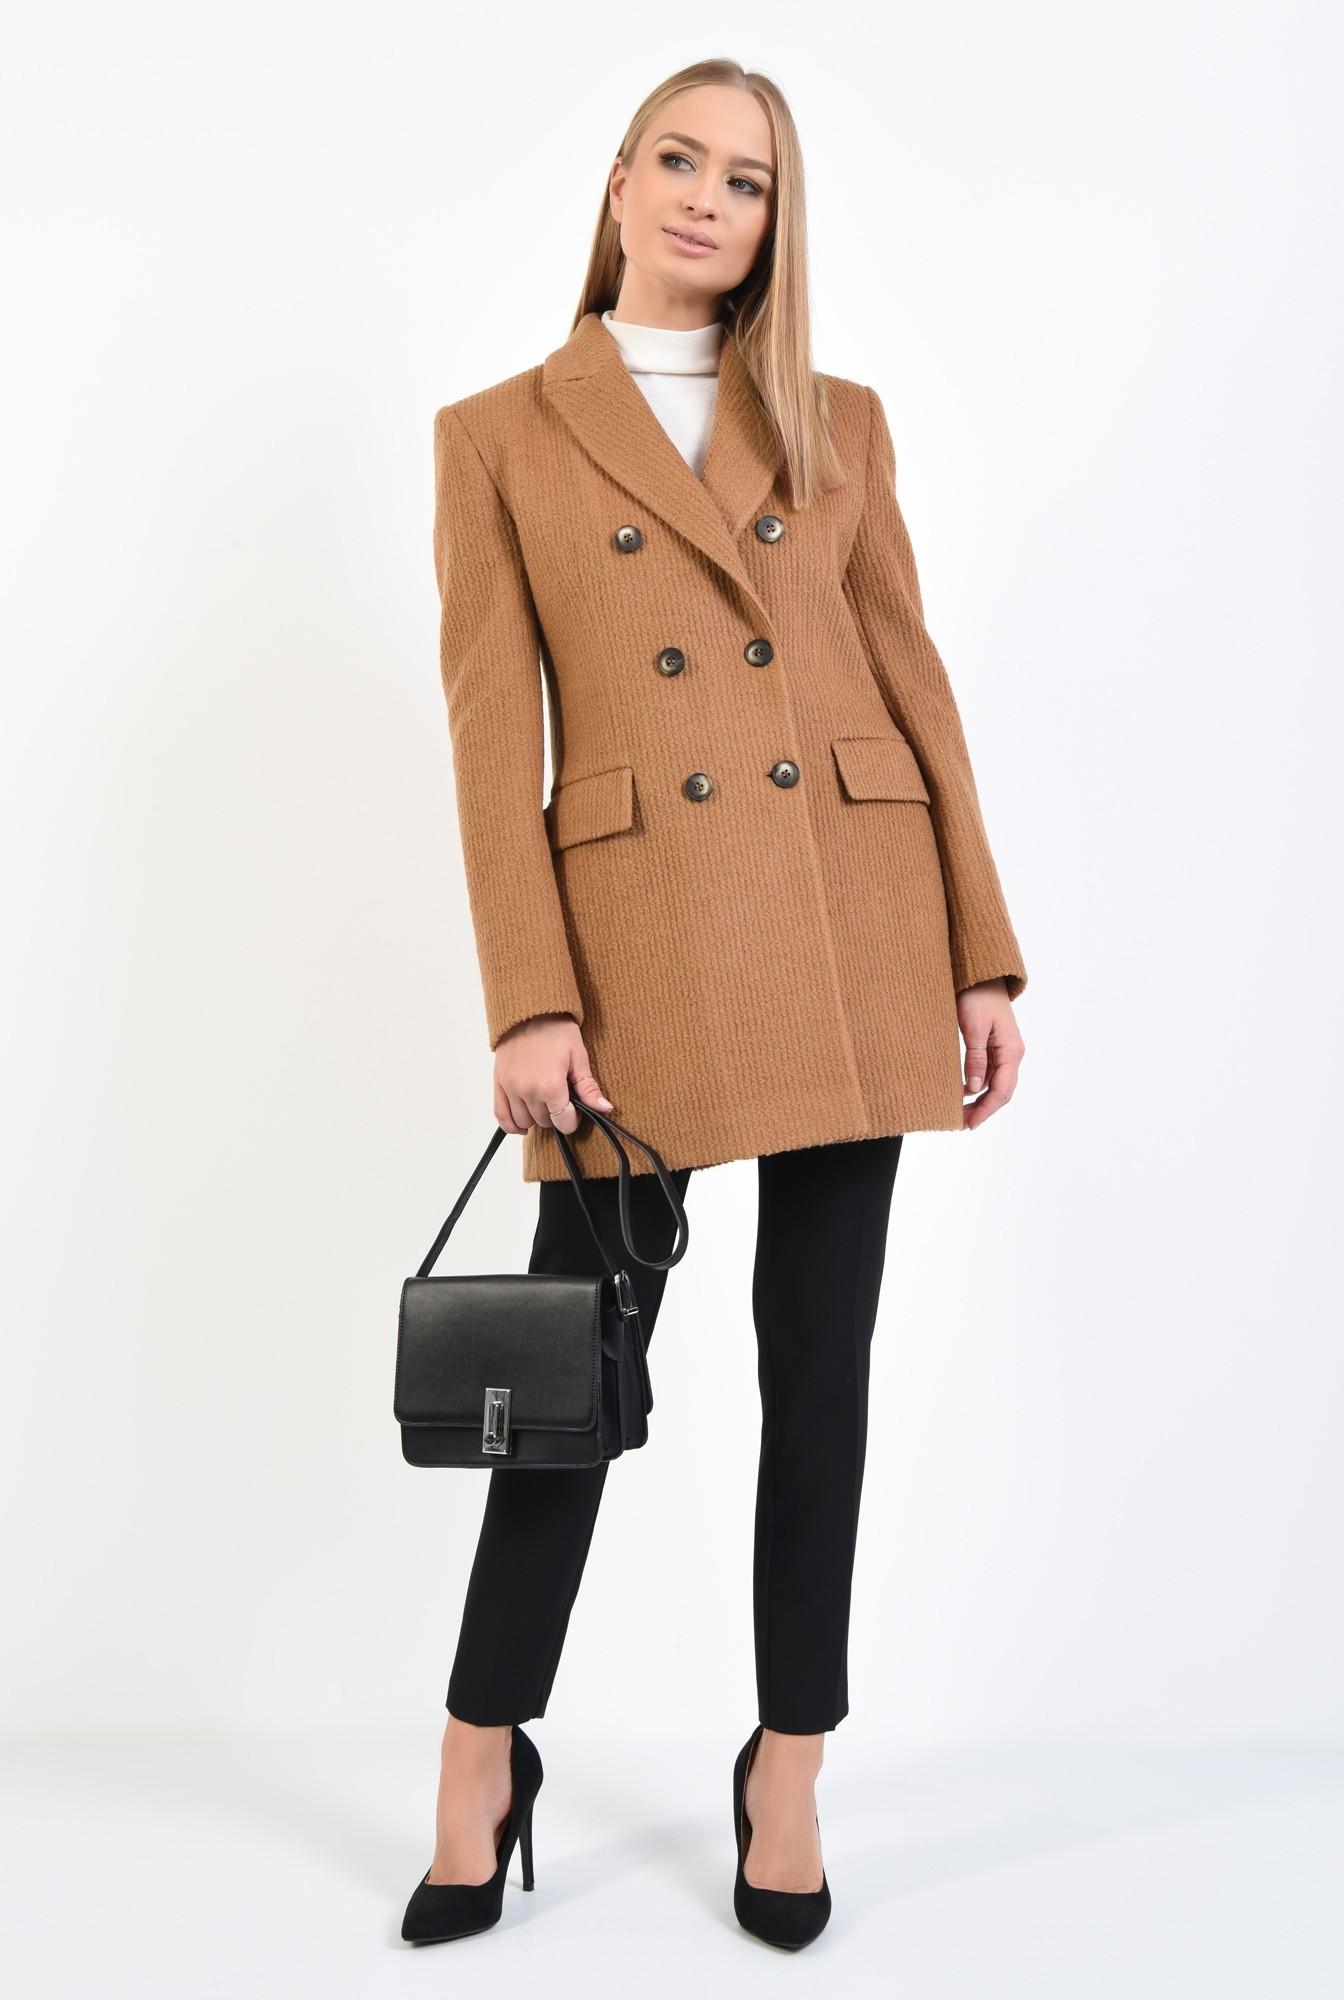 3 - palton scurt, revere crestate, doua randuri de nasturi